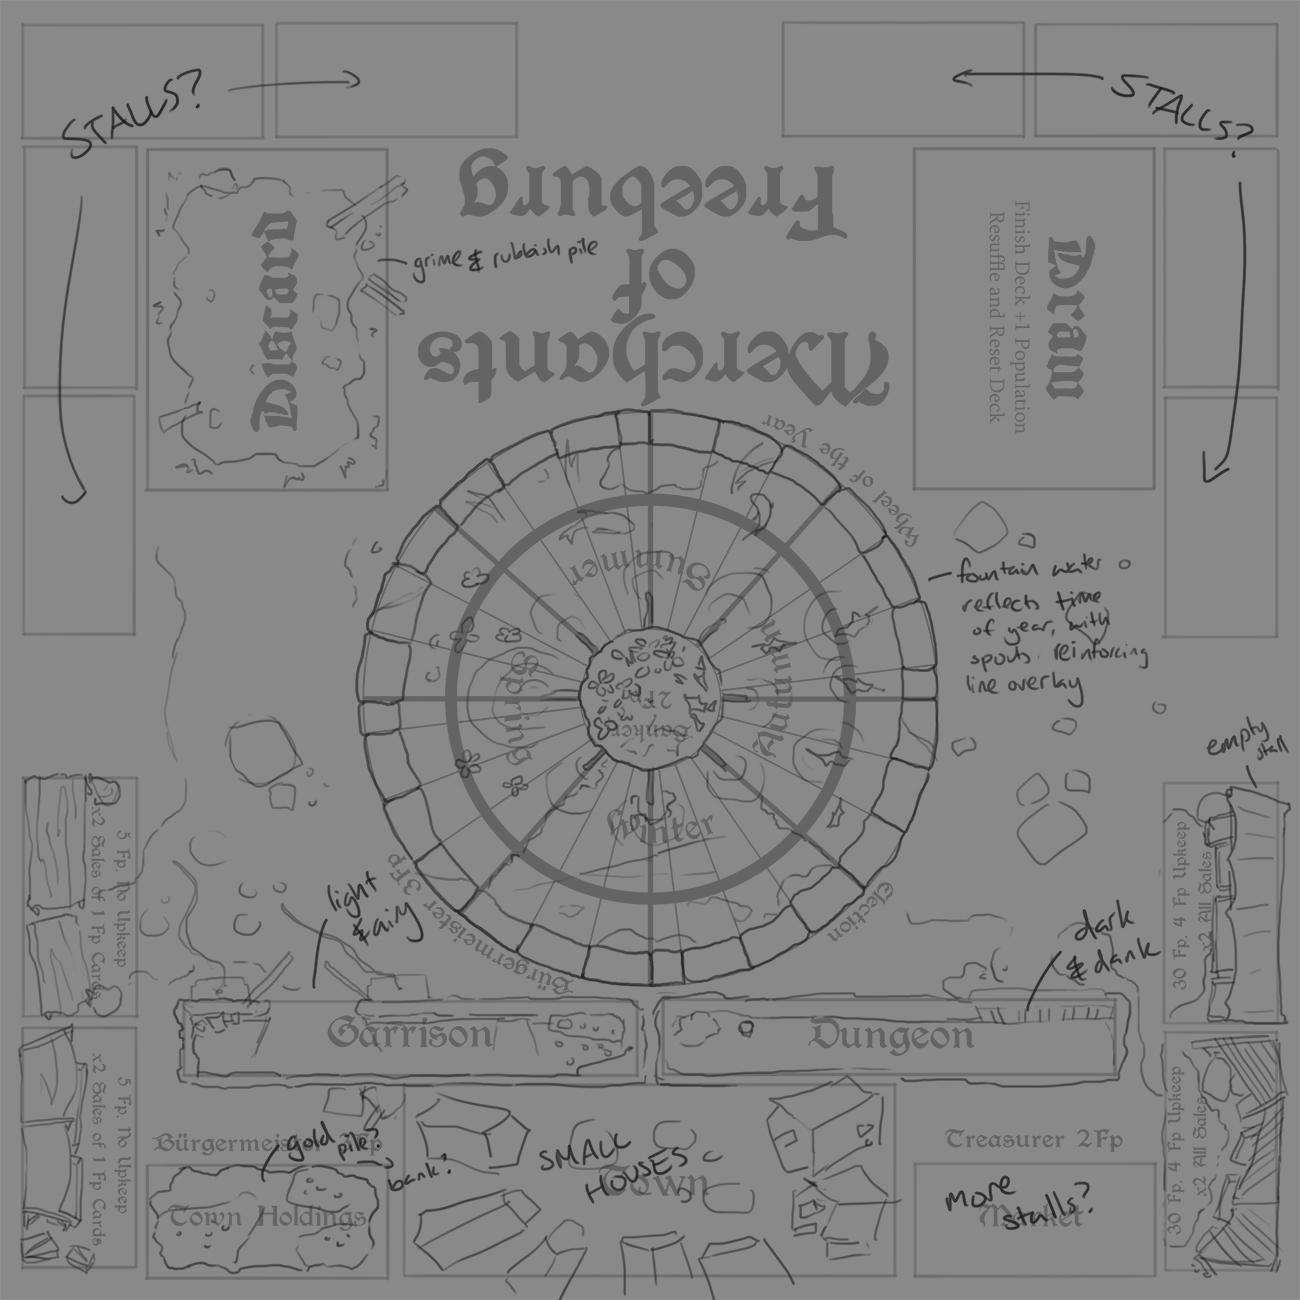 14_09_01_boardgamedesign_sketchannotations.jpg